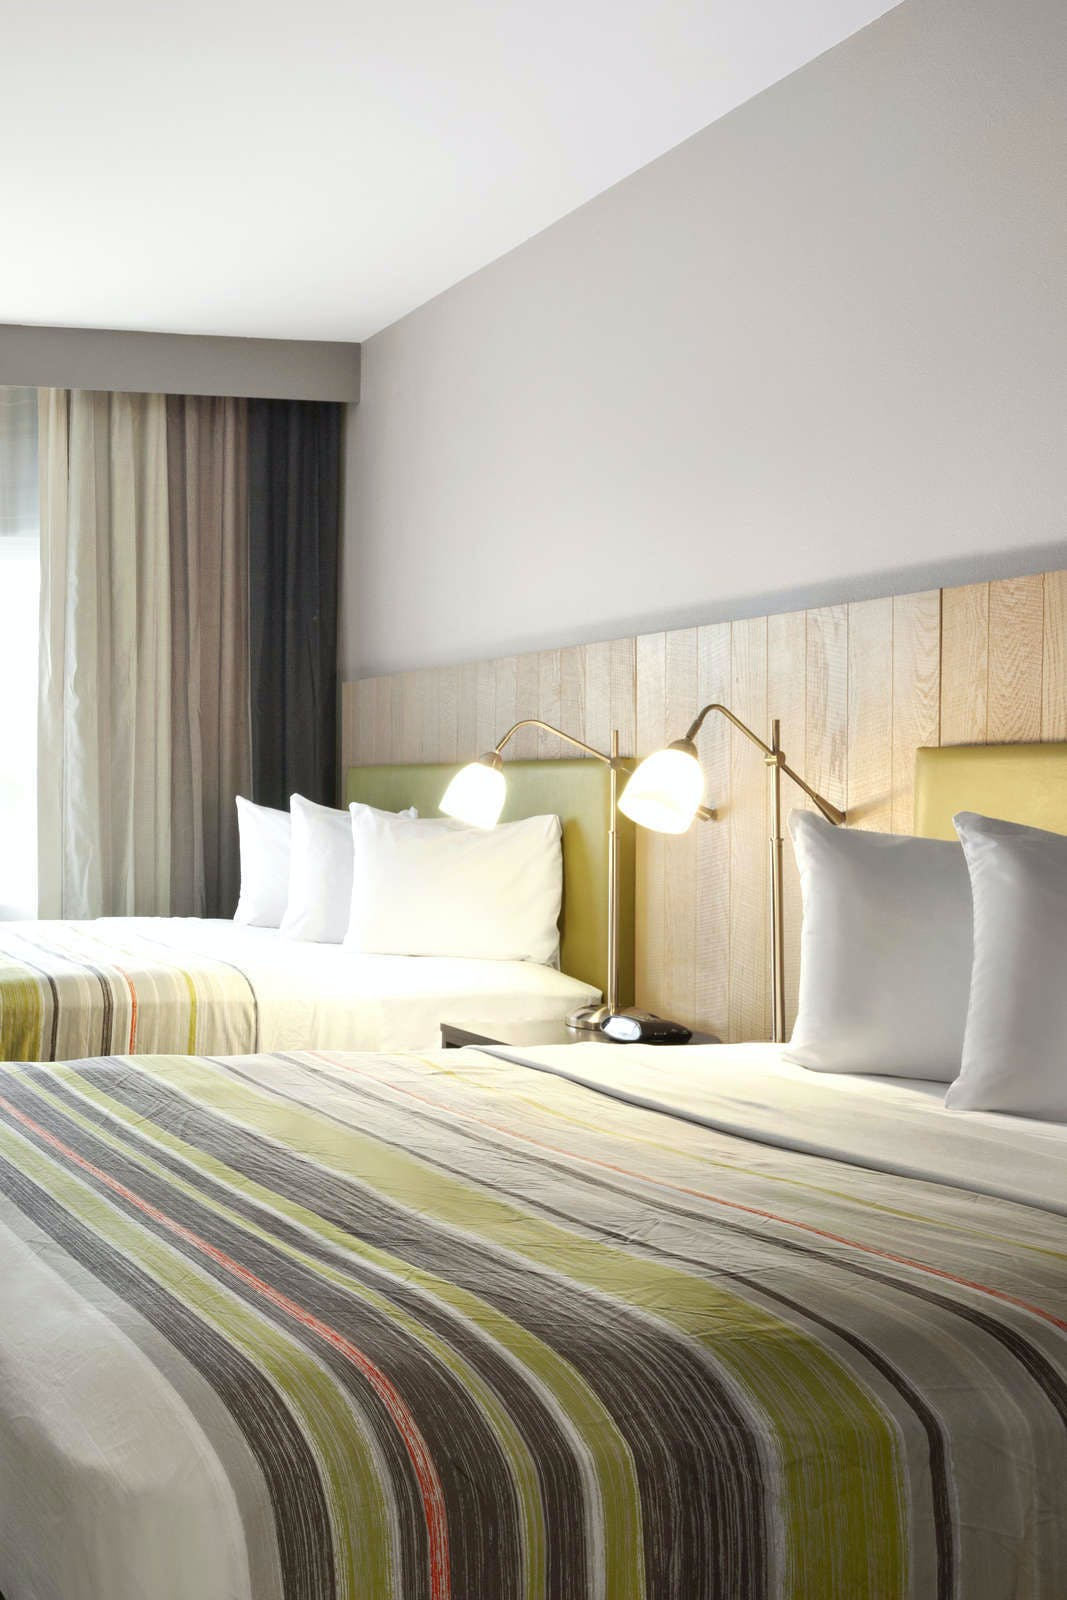 Country Inn & Suites Anaheim